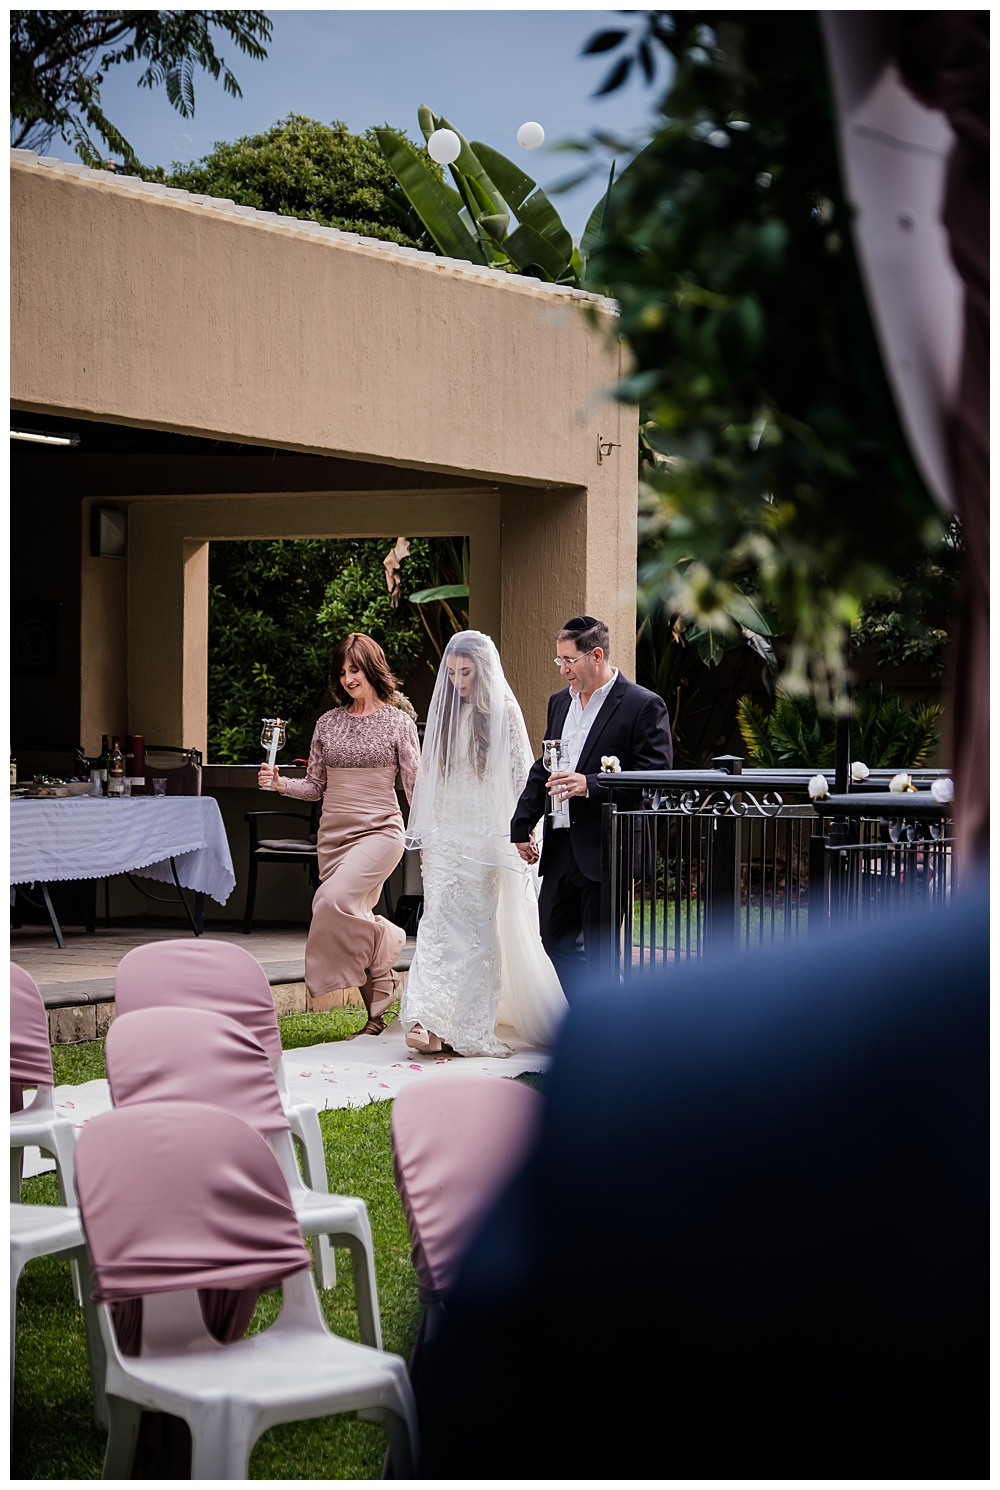 Best_Wedding_Photographer_AlexanderSmith_1521.jpg